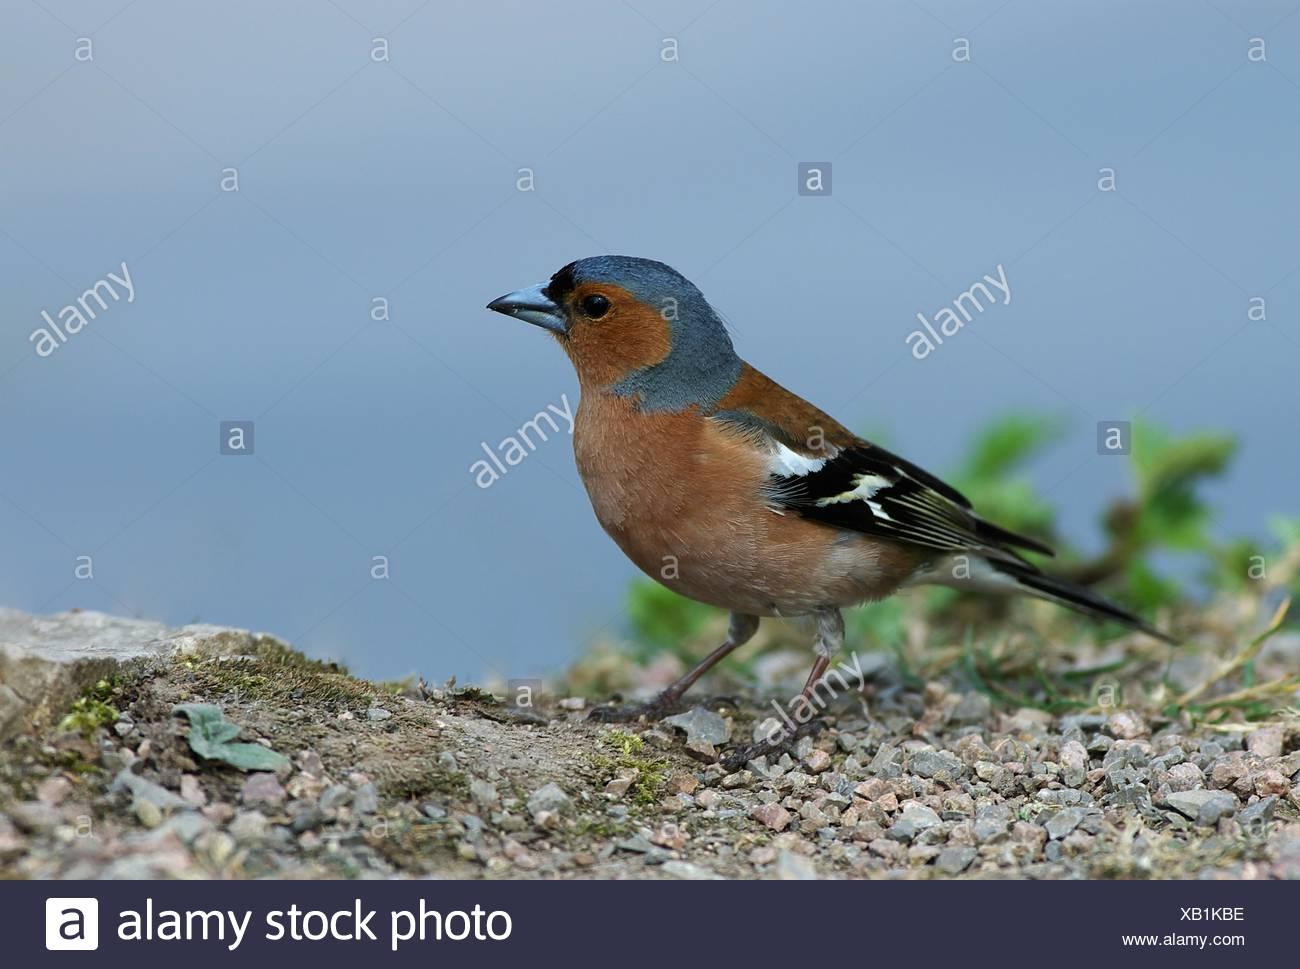 bird birds singing-bird bobolinks chaffinch finch nature blue animal bird brown - Stock Image